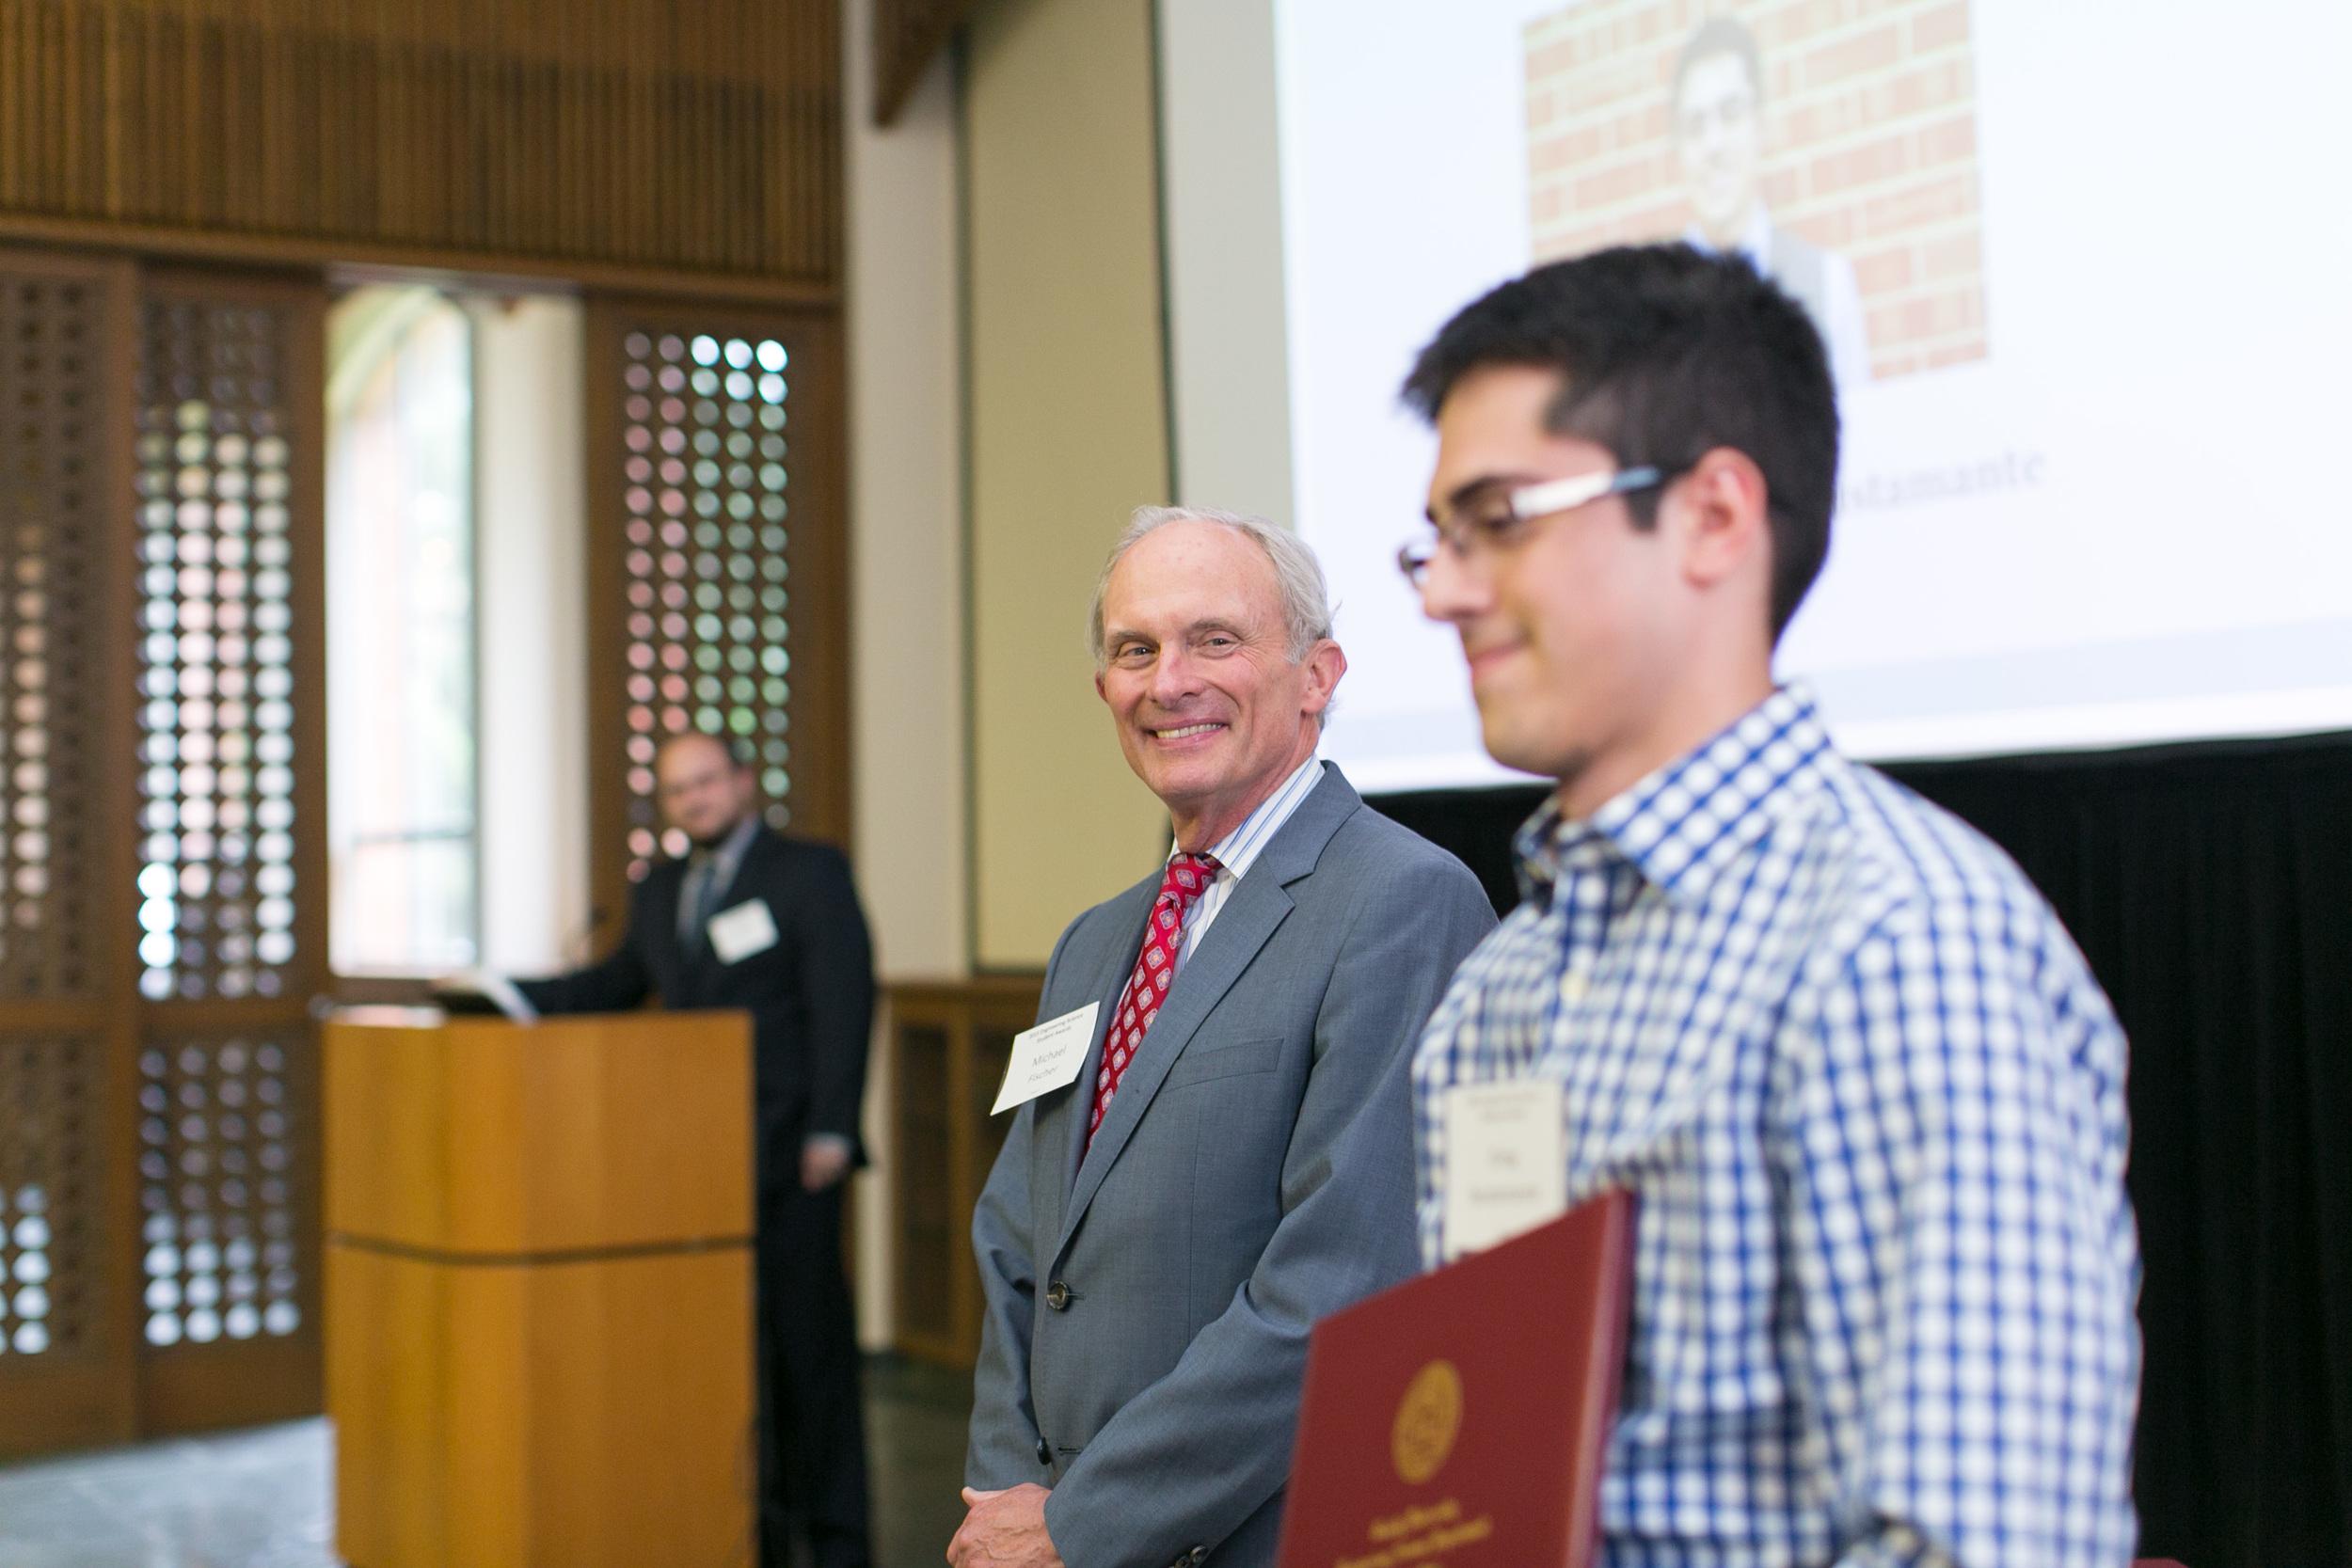 076-Engineering Awards.jpg